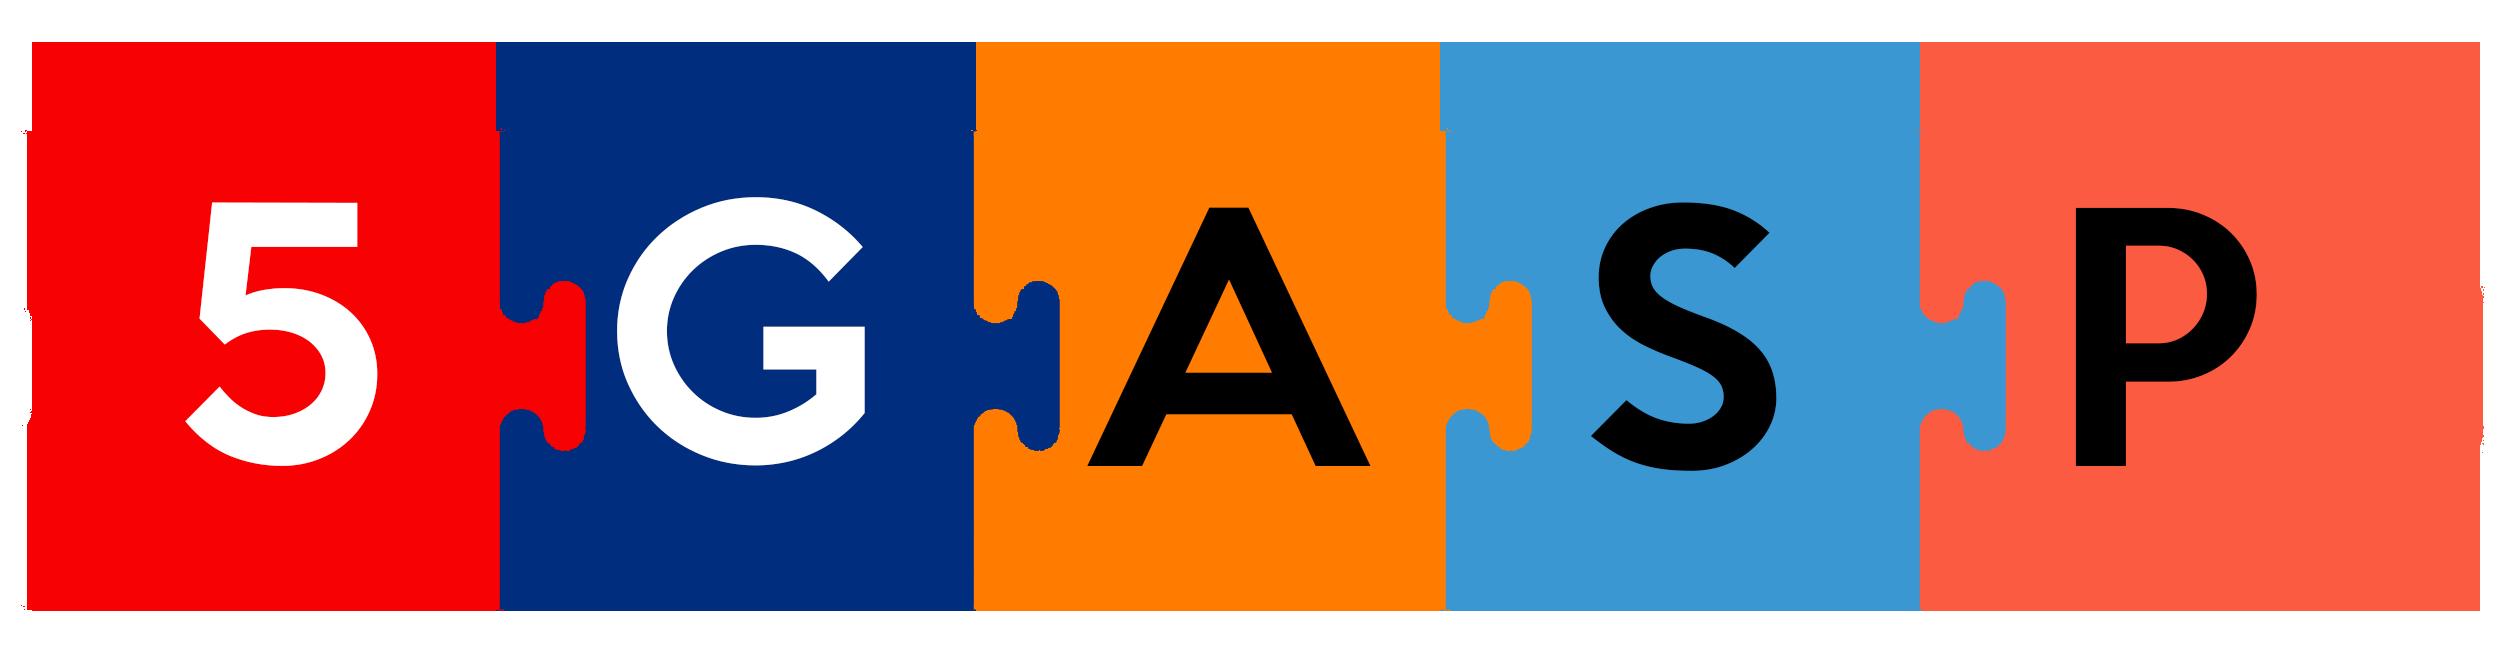 5gasp-logo-1